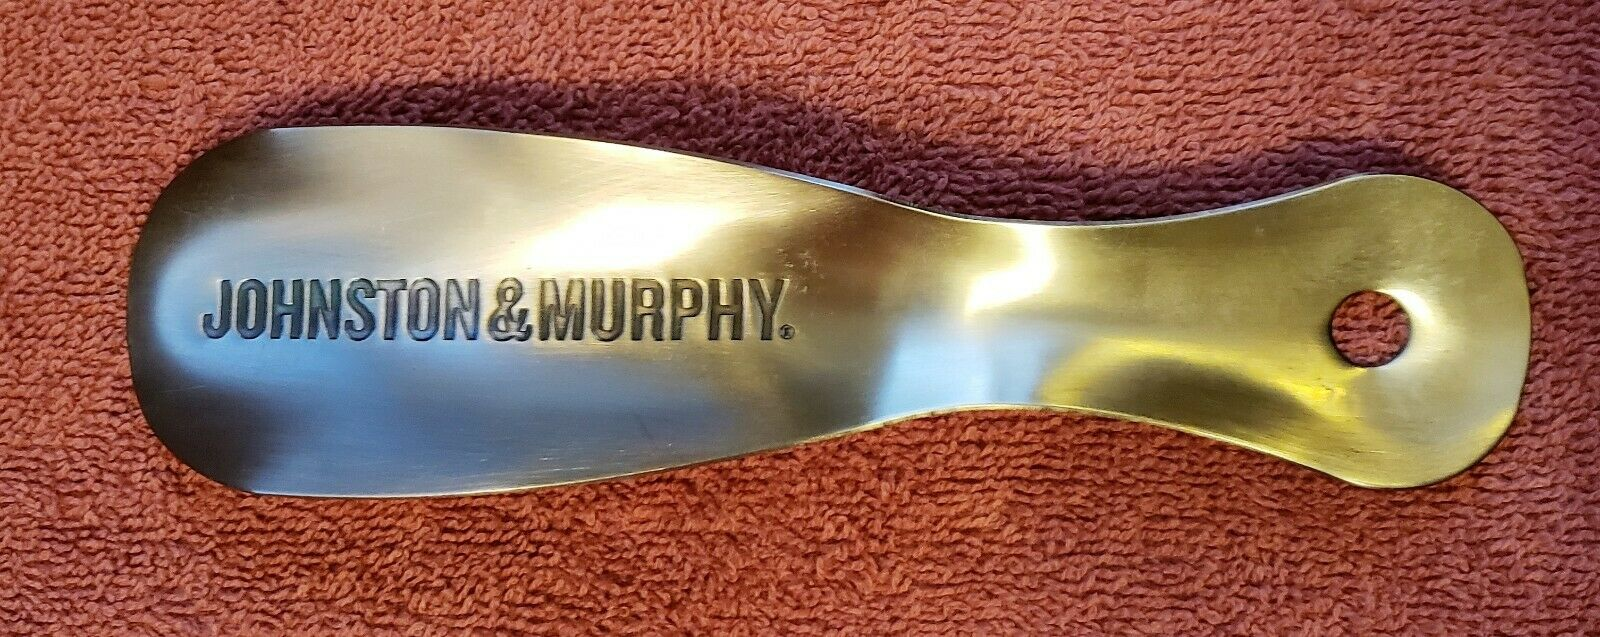 "JOHNSTON & MURPHY Shoe Horn  Pro Fitter 7 1/4"" 930185"